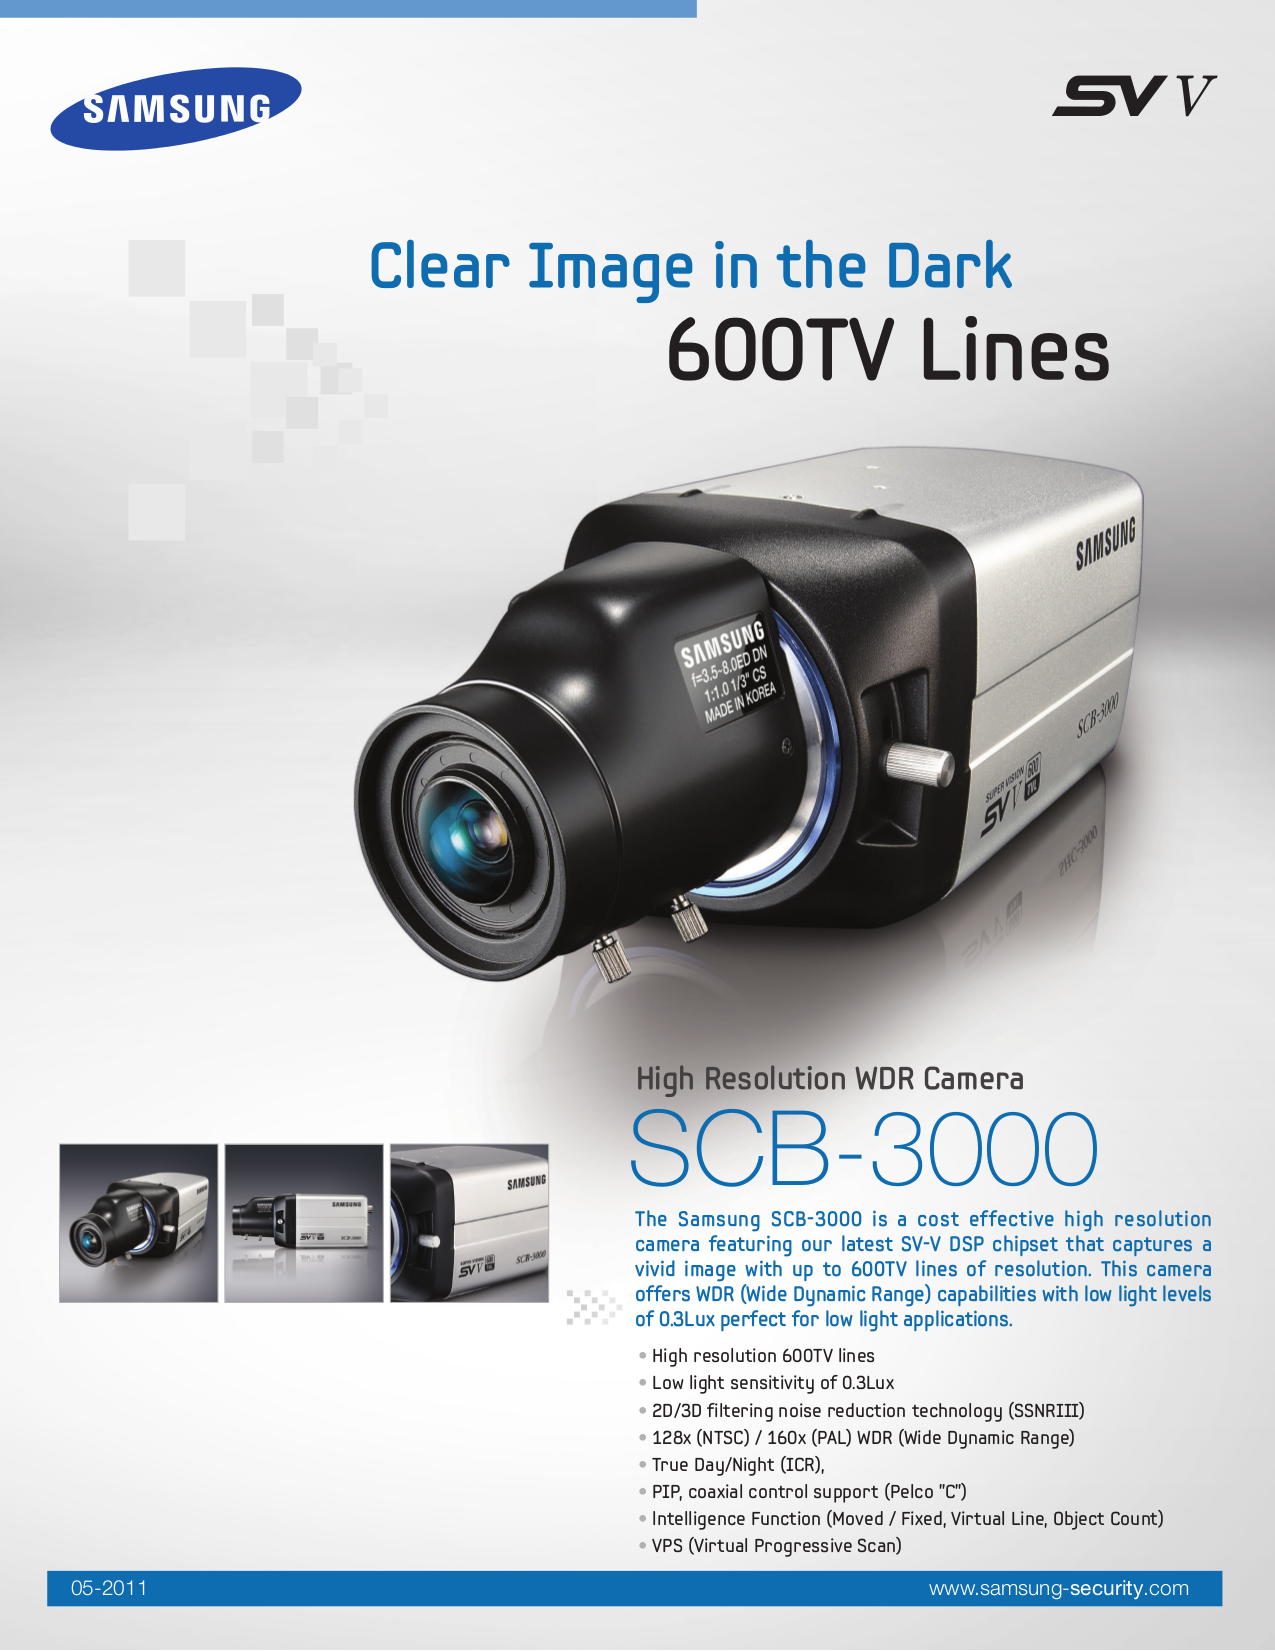 CCTV Security Pros